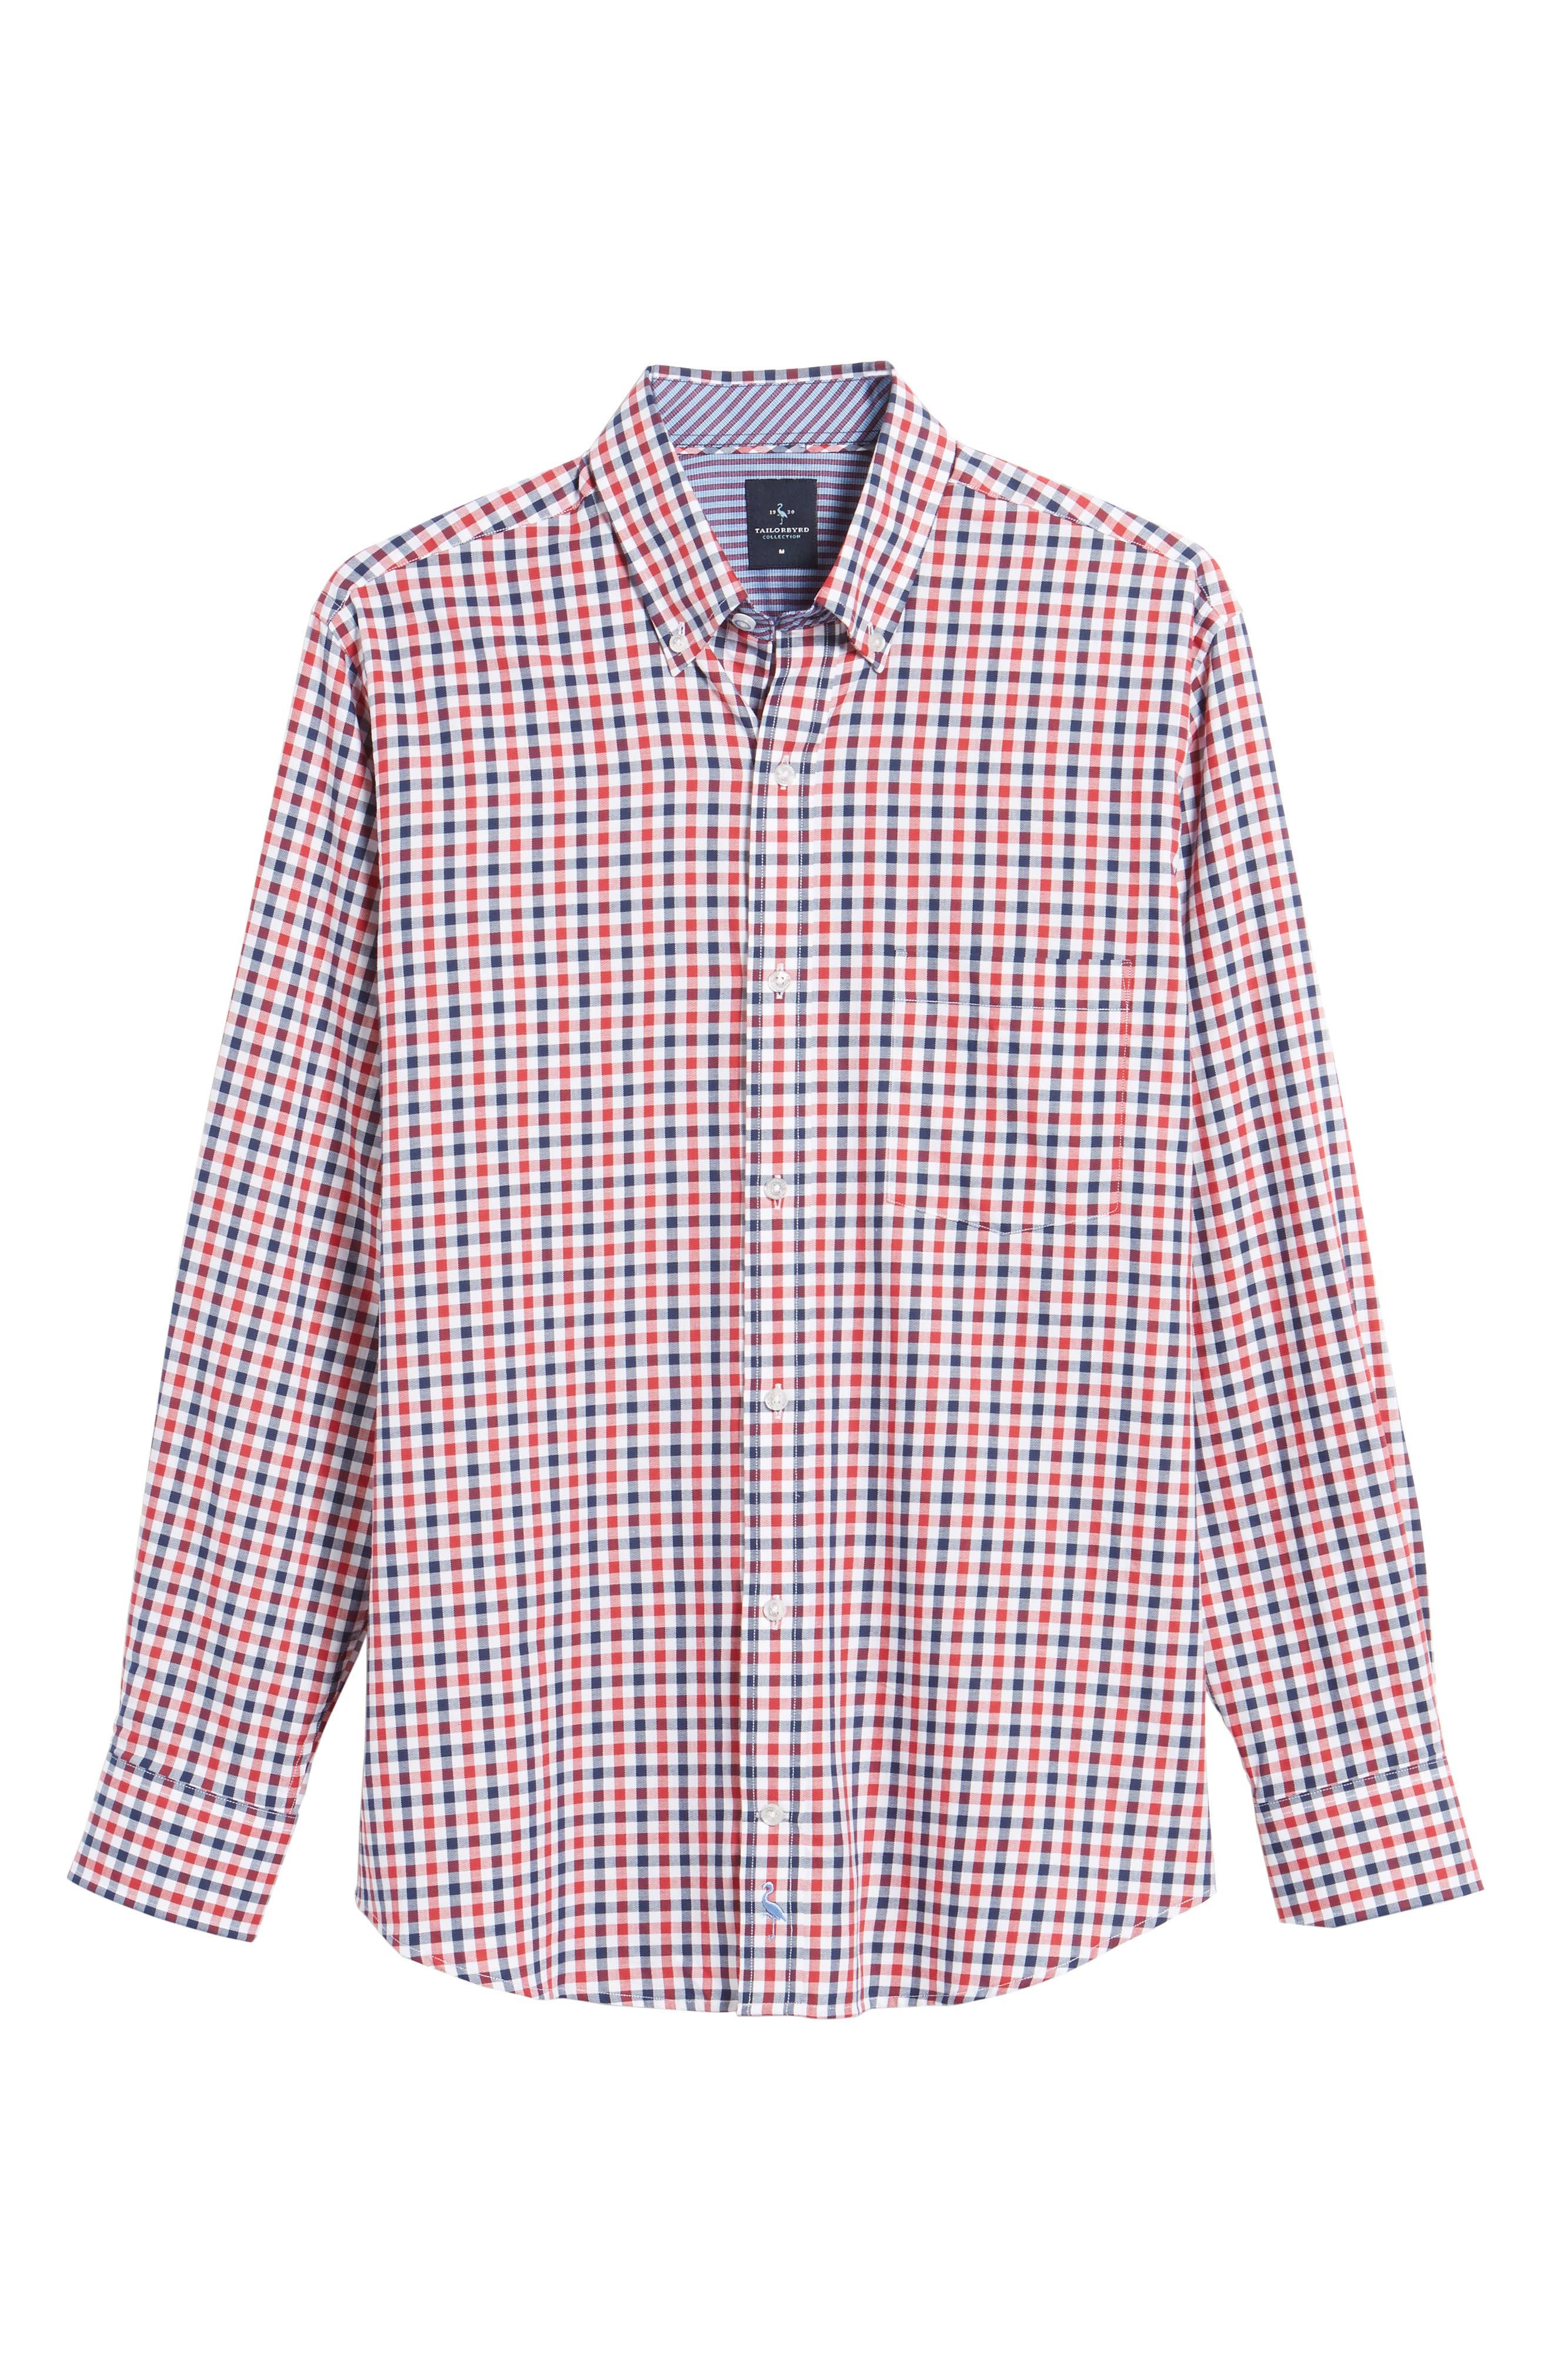 Bernice Check Sport Shirt,                             Alternate thumbnail 6, color,                             600